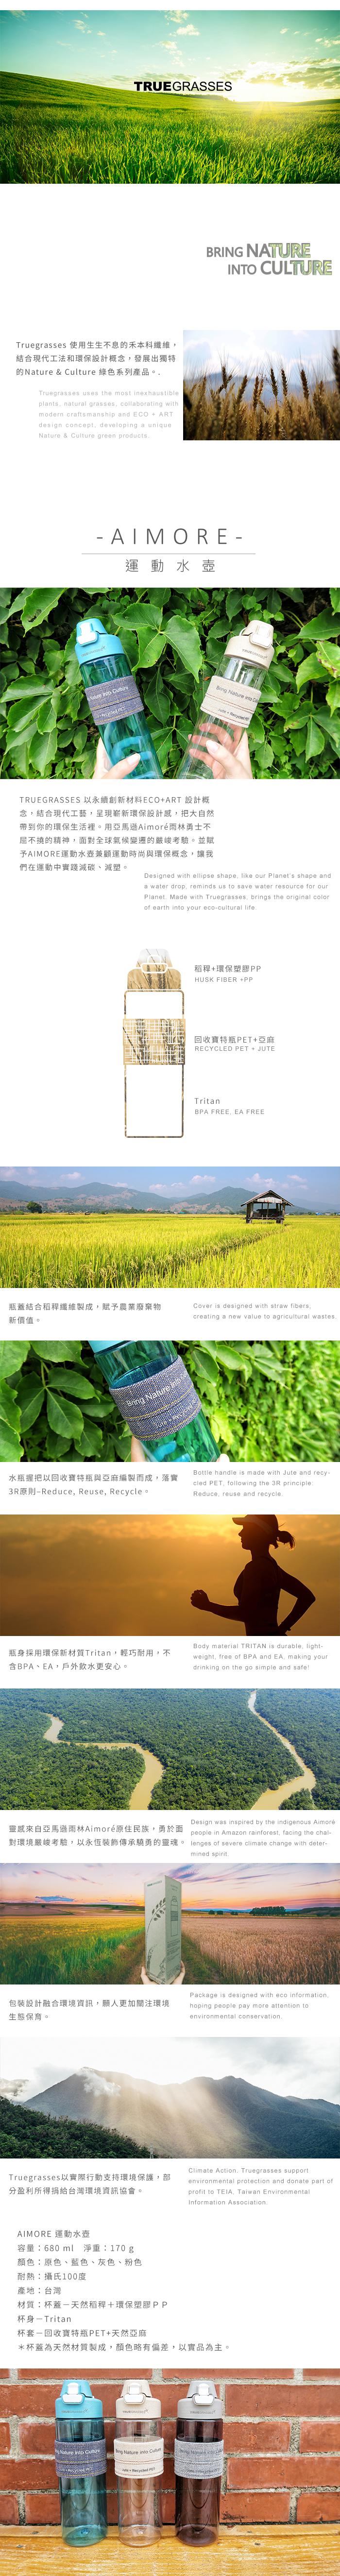 Truegrasses AIMORE 運動水壺